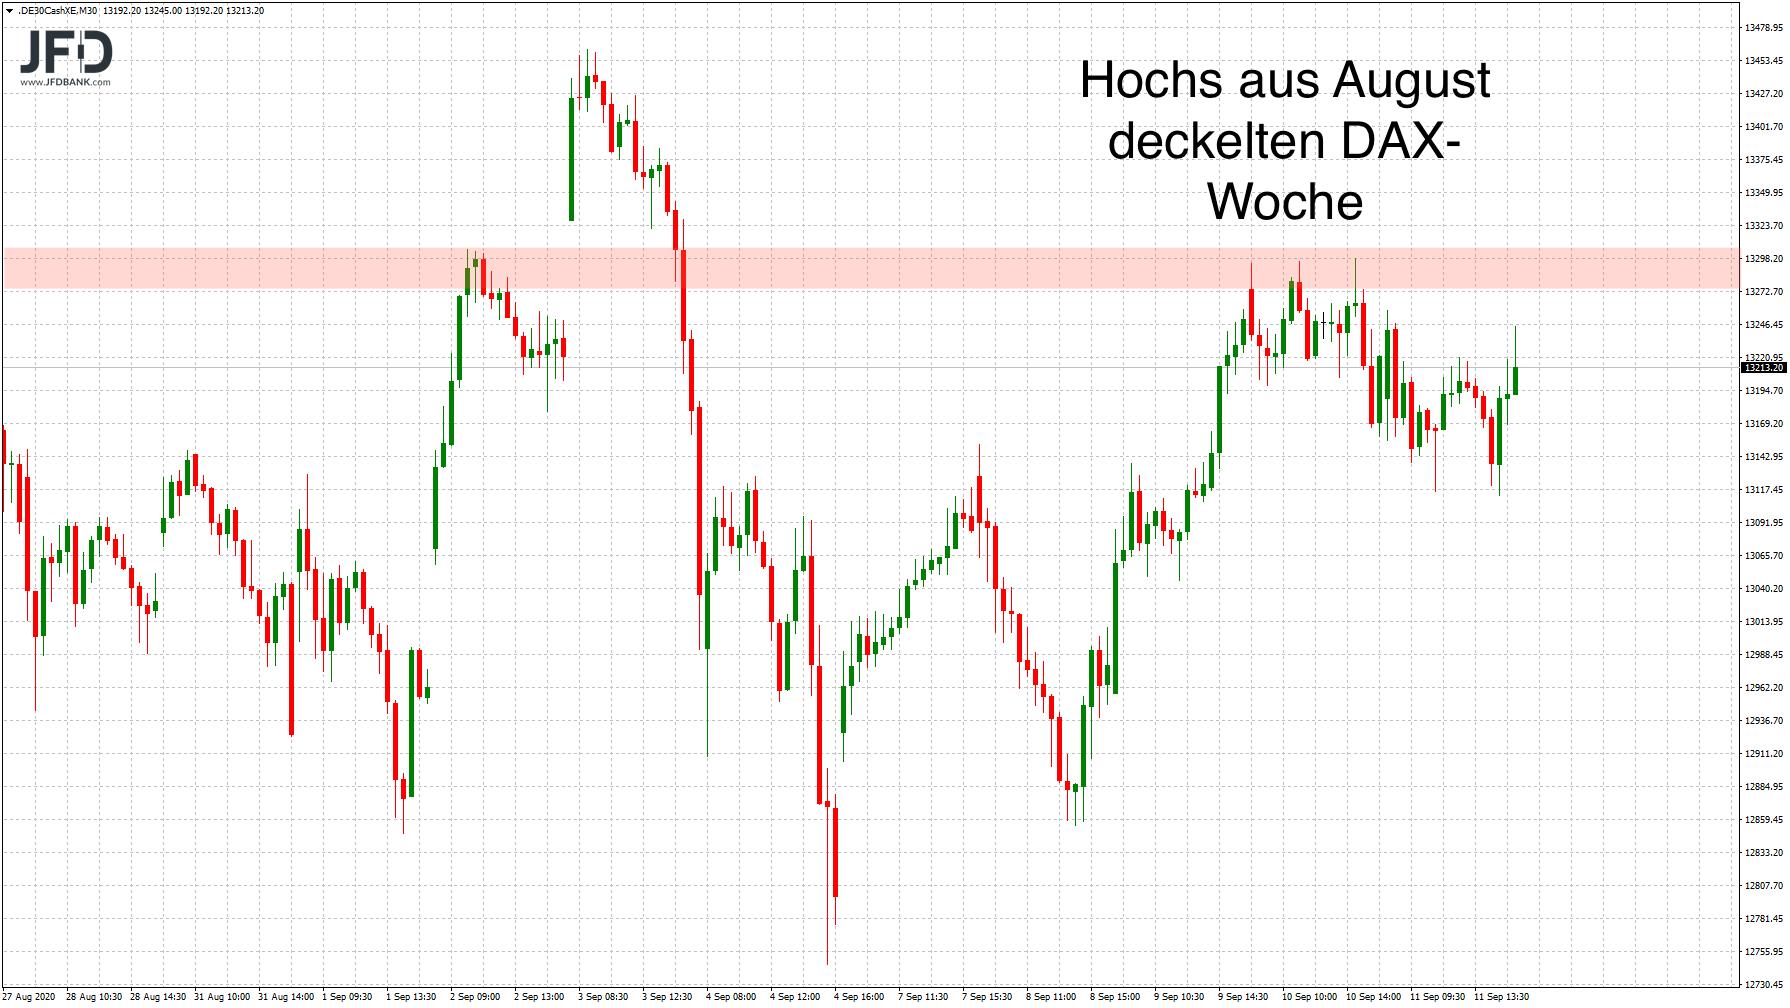 Wochenstart-im-DAX-erneut-unter-Volldampf-Kommentar-JFD-Bank-GodmodeTrader.de-2